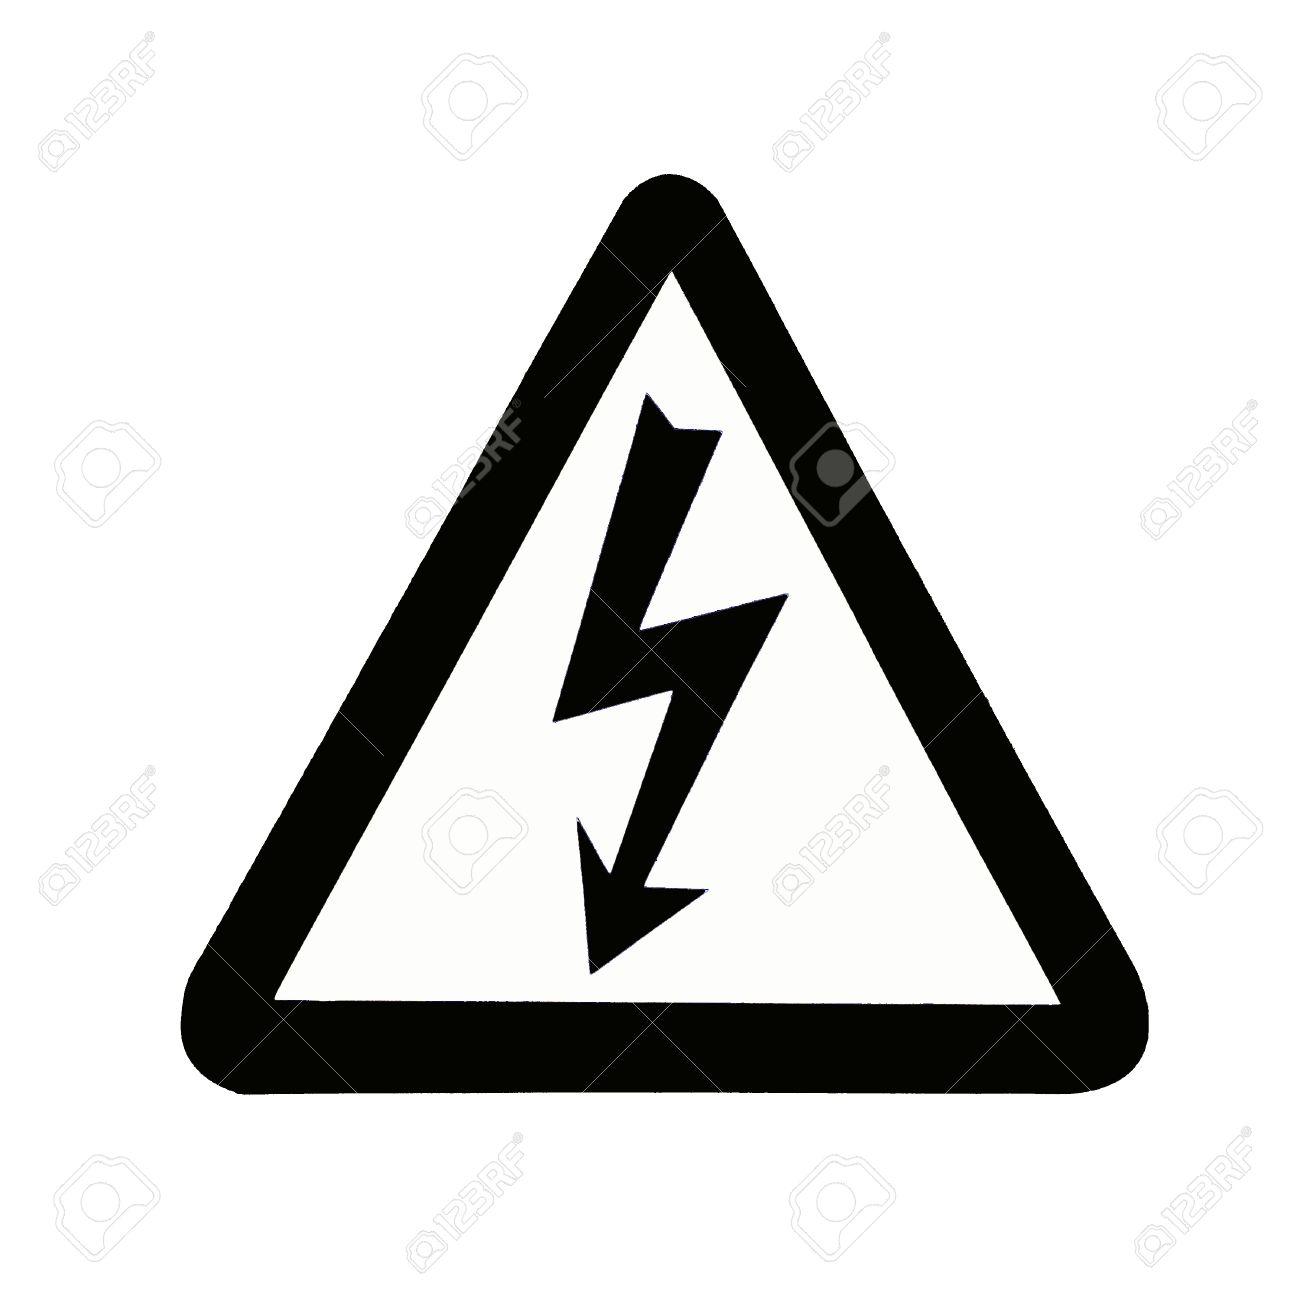 High voltage symbol image collections symbol and sign ideas high voltage sign symbol stock photo picture and royalty free high voltage sign symbol stock photo buycottarizona